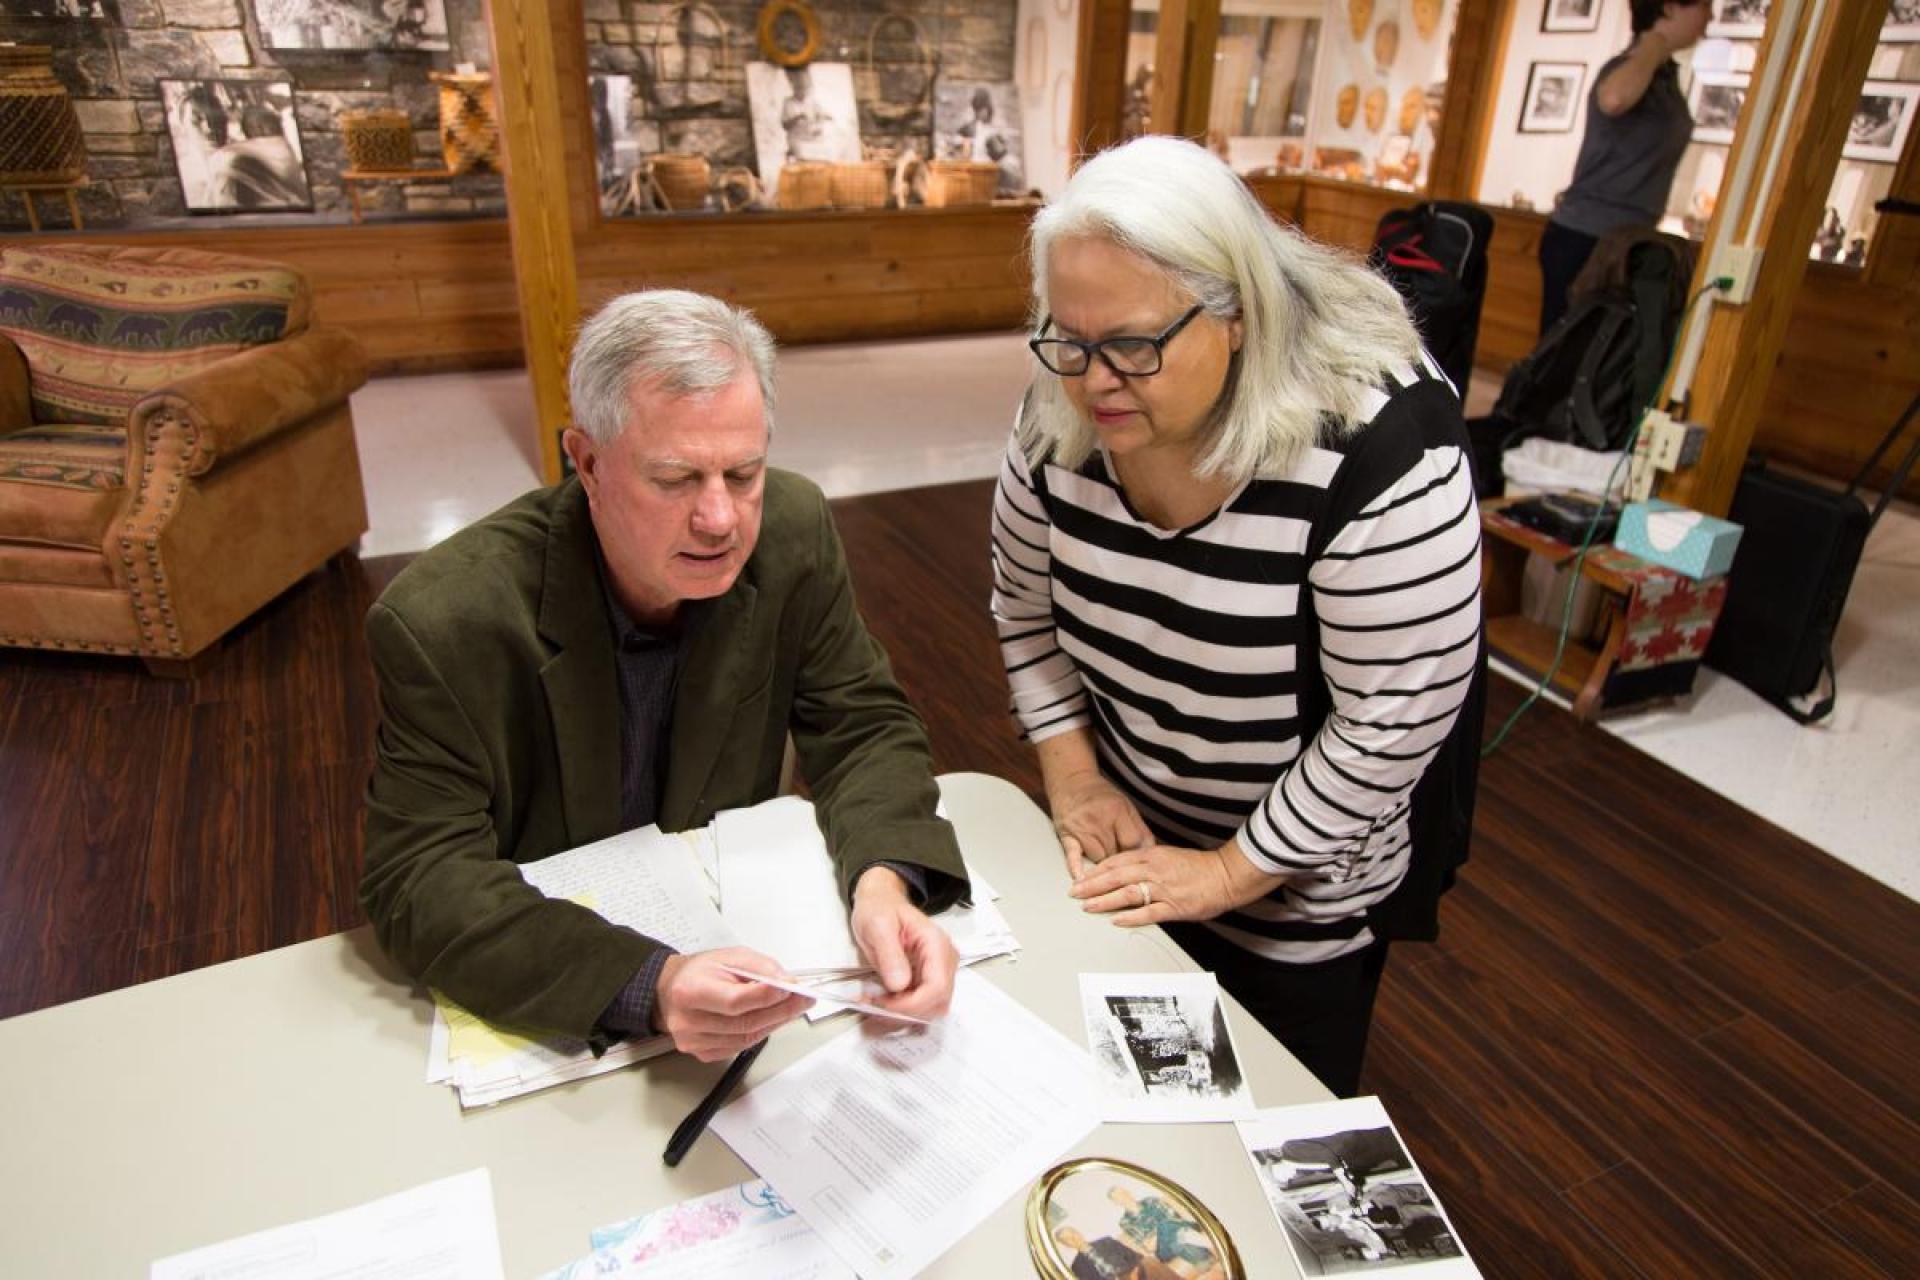 Wayne Martin and a member of the Sneed family looking at photographs at a table